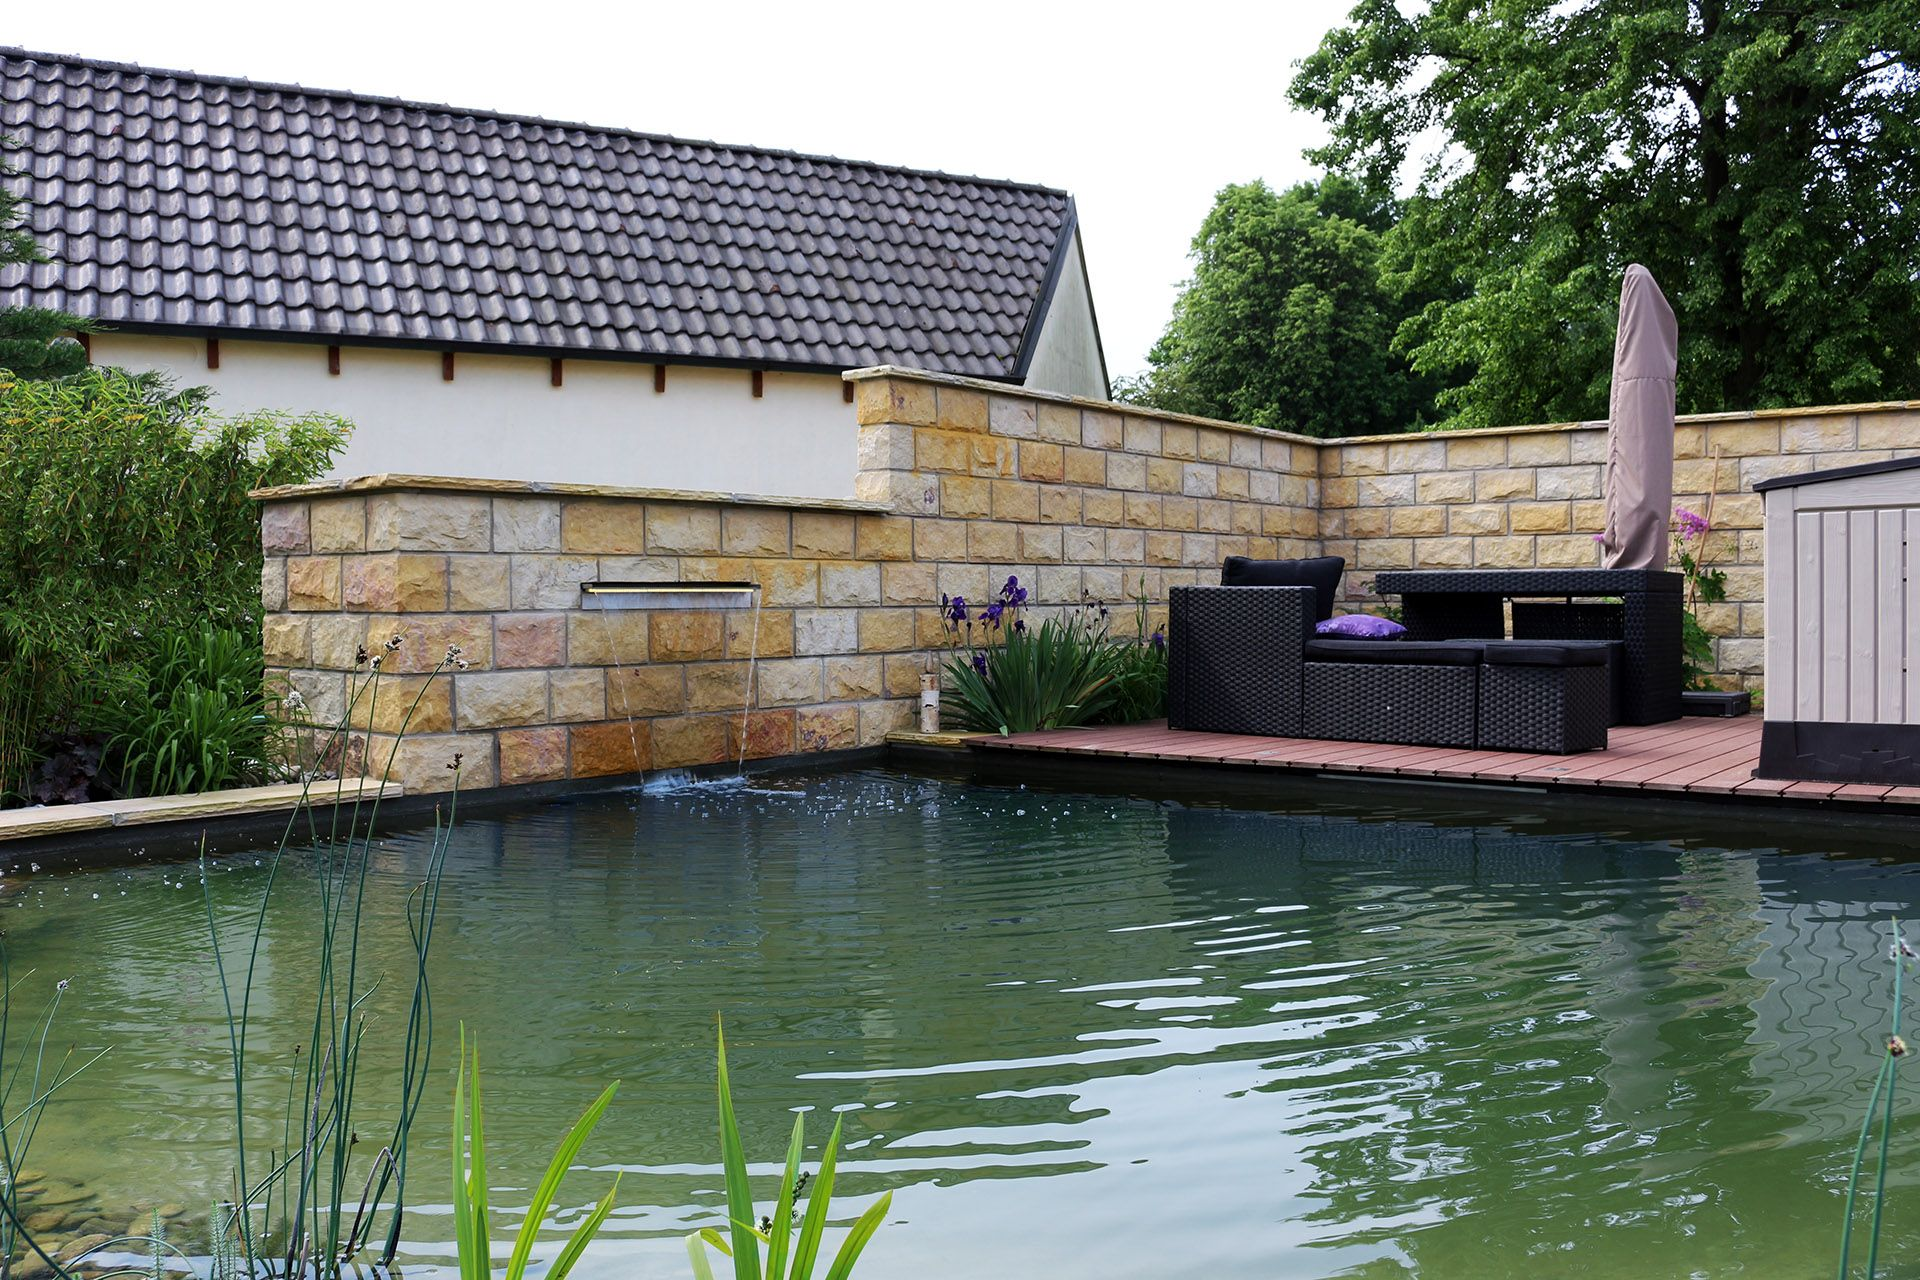 How To Make An Interesting Art Piece Using Tree Branches Ehow Schwimmteich Garten Landschaftsbau Natur Pool